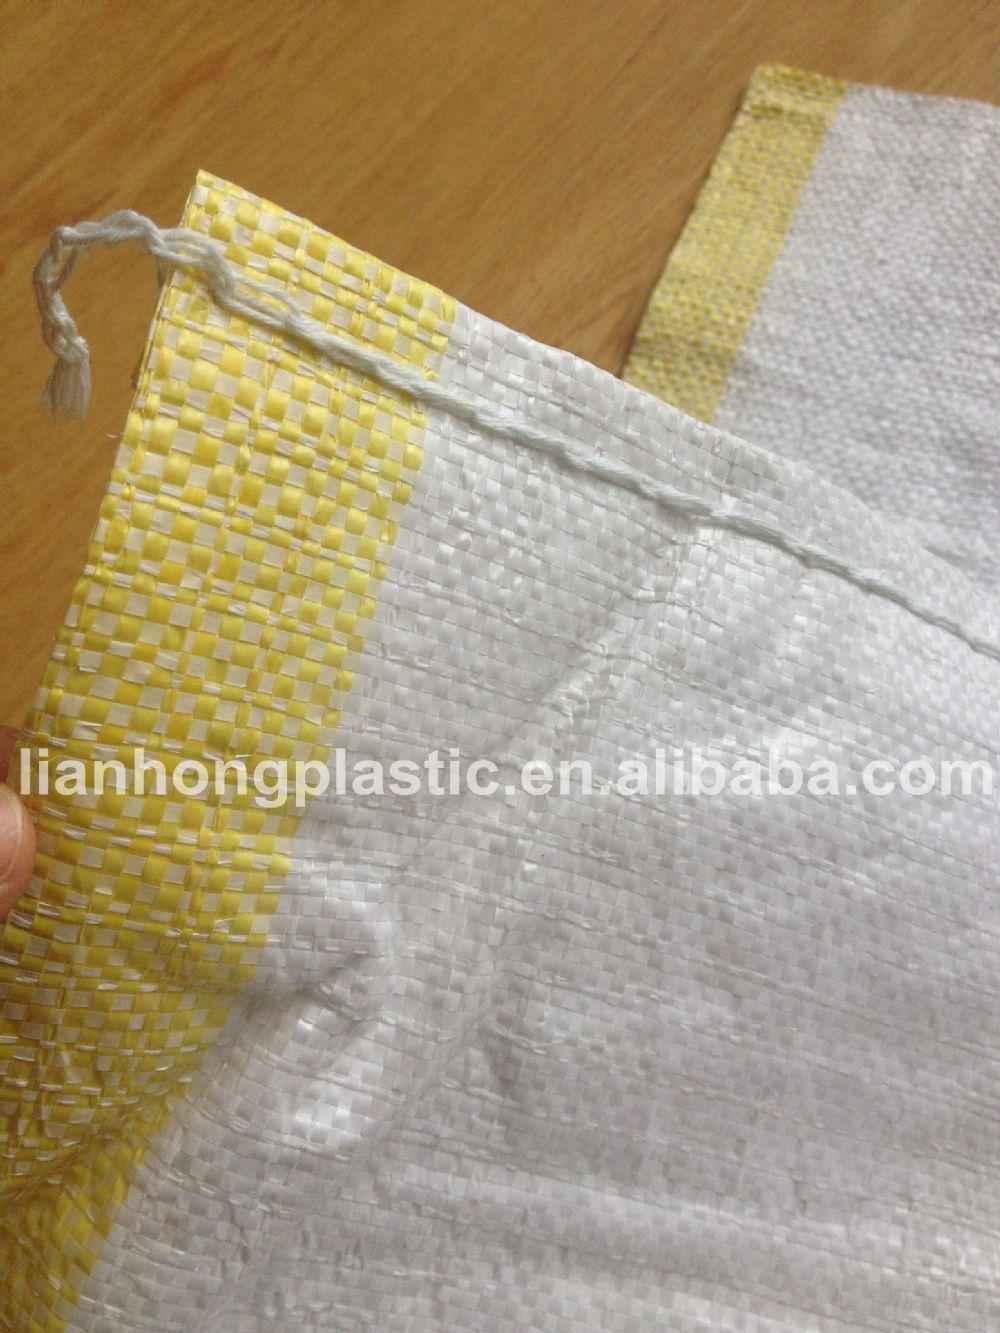 Factory Price Brown Sugar 25kg 50kg 100kg Bag,Pp Woven Sugar Bag ...